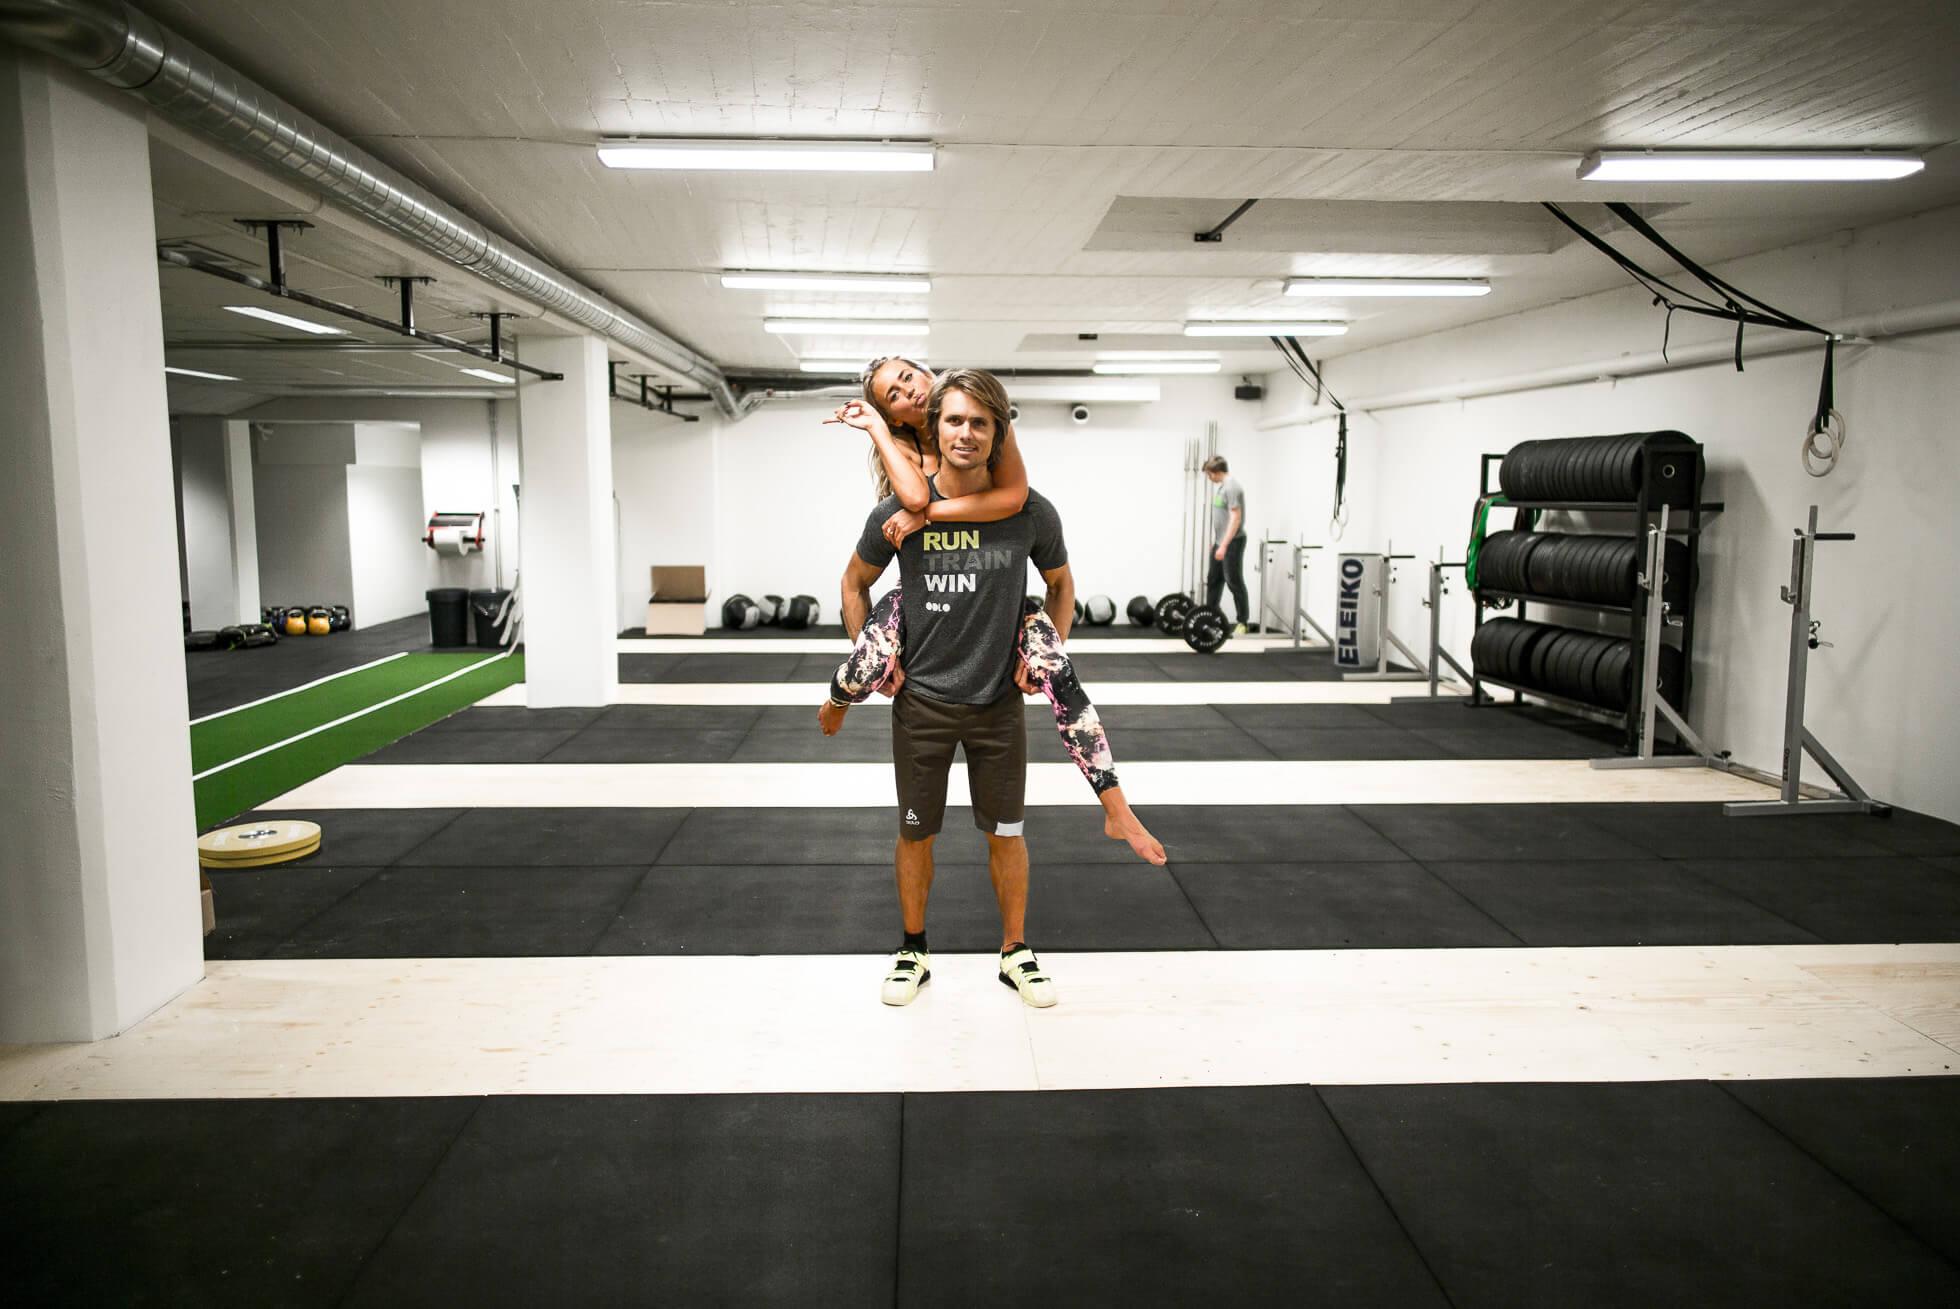 janni-deler-gym-crossfit-atum-stockholmL1000236